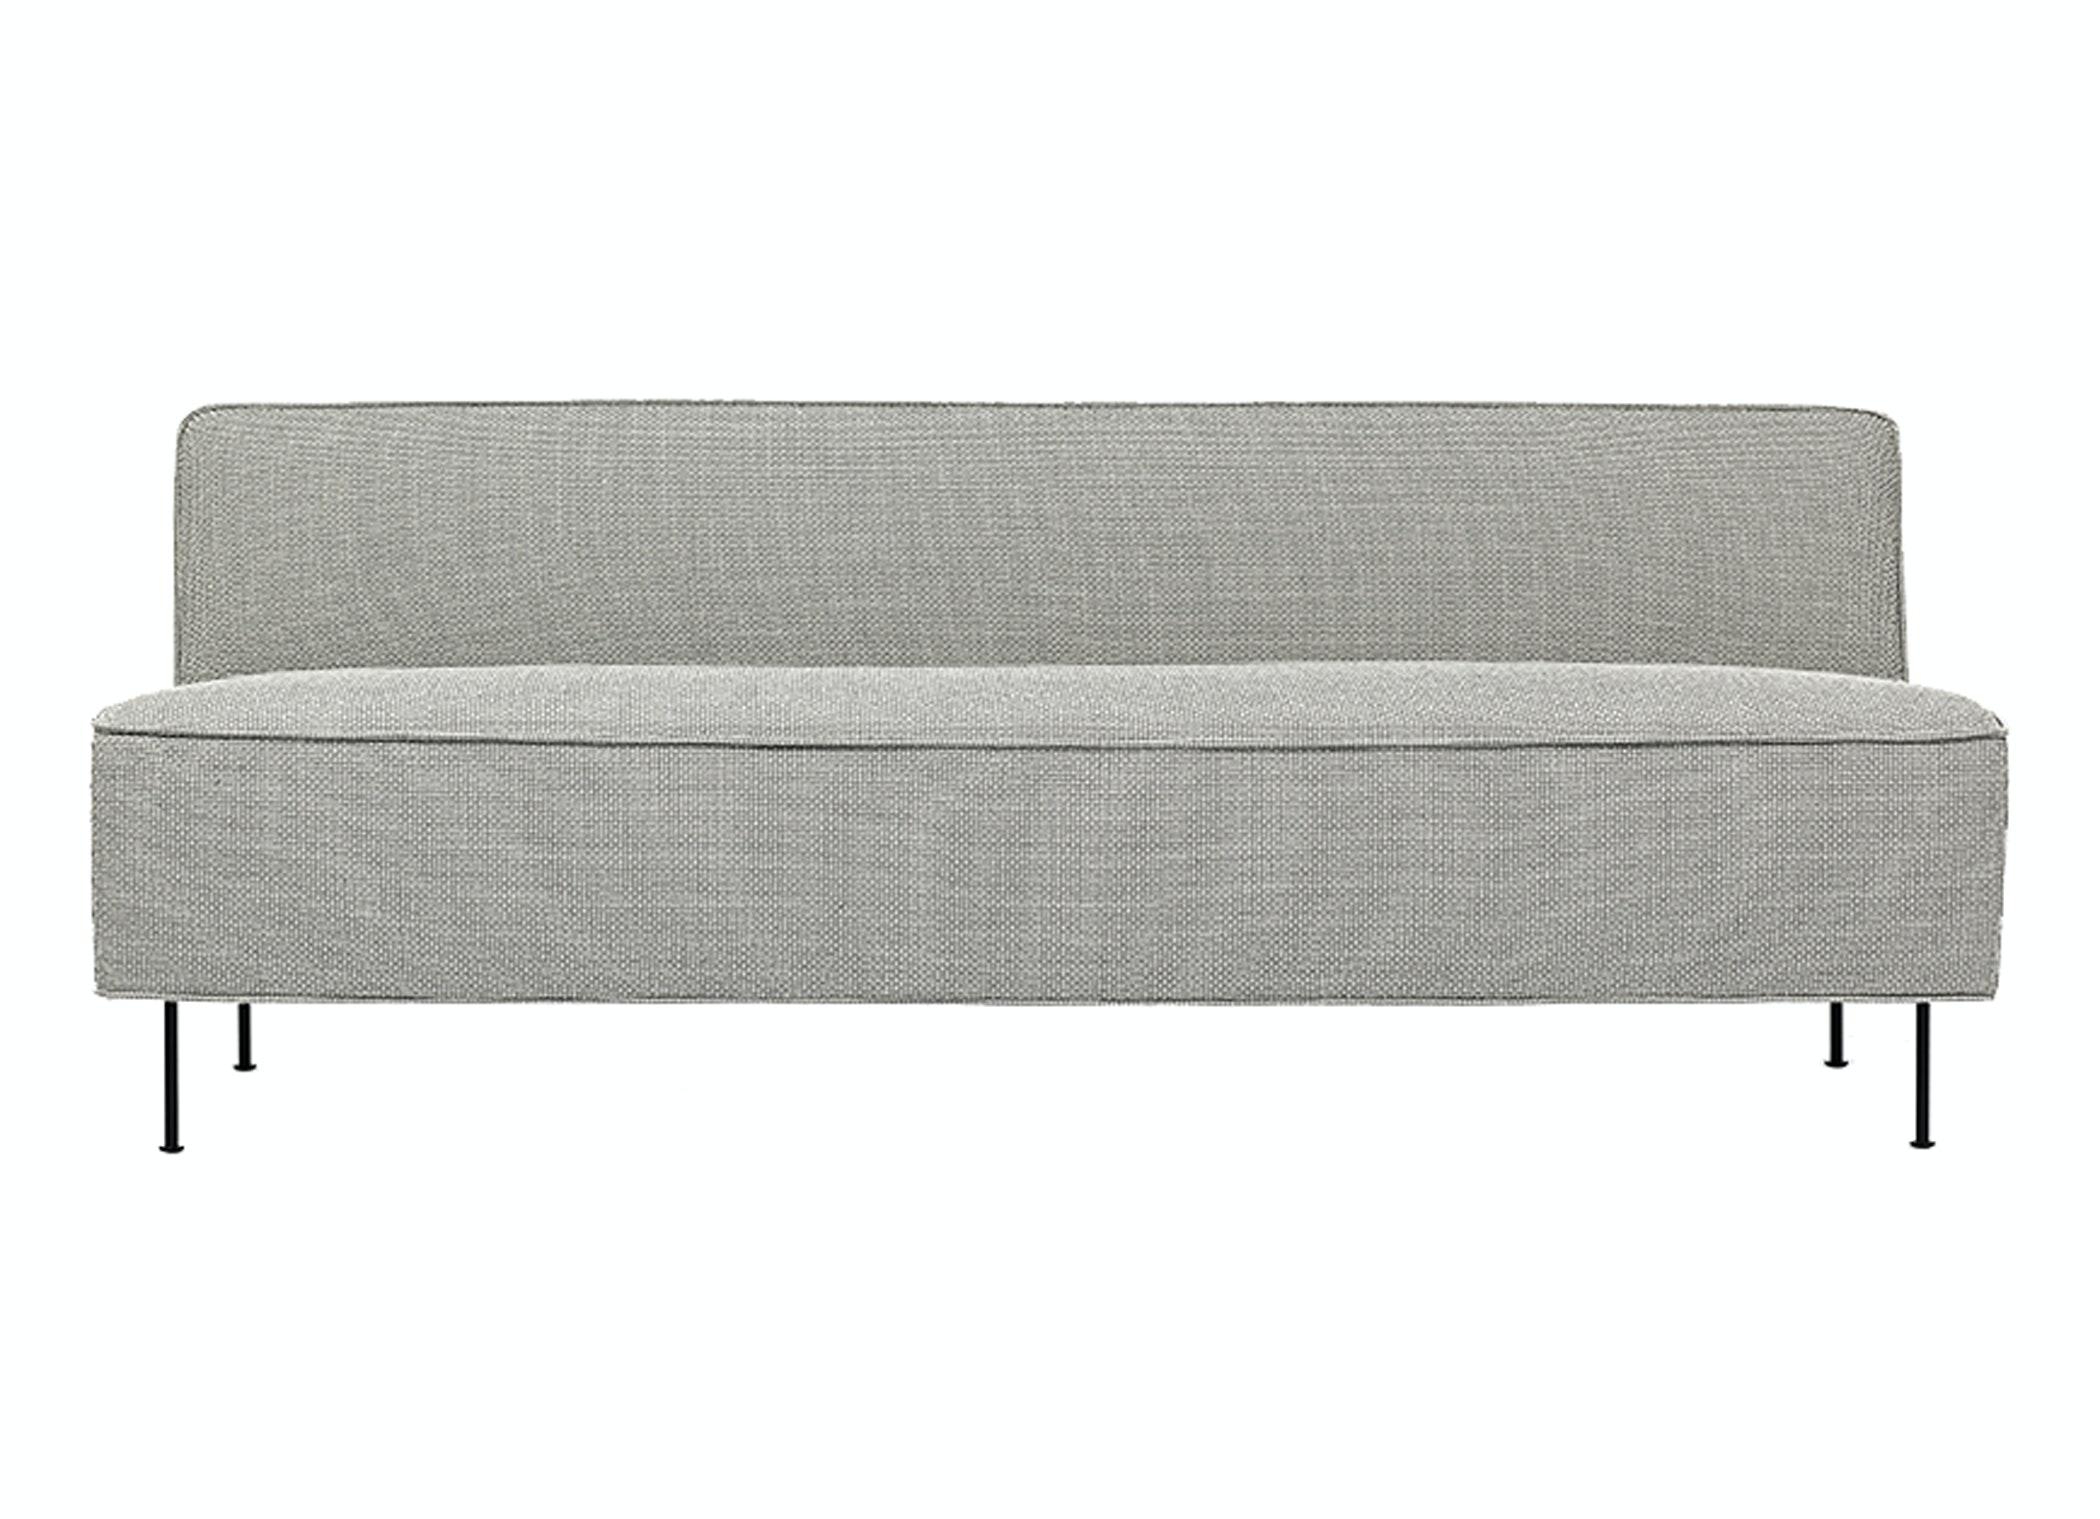 Modern Line Sofa 2Seater Image